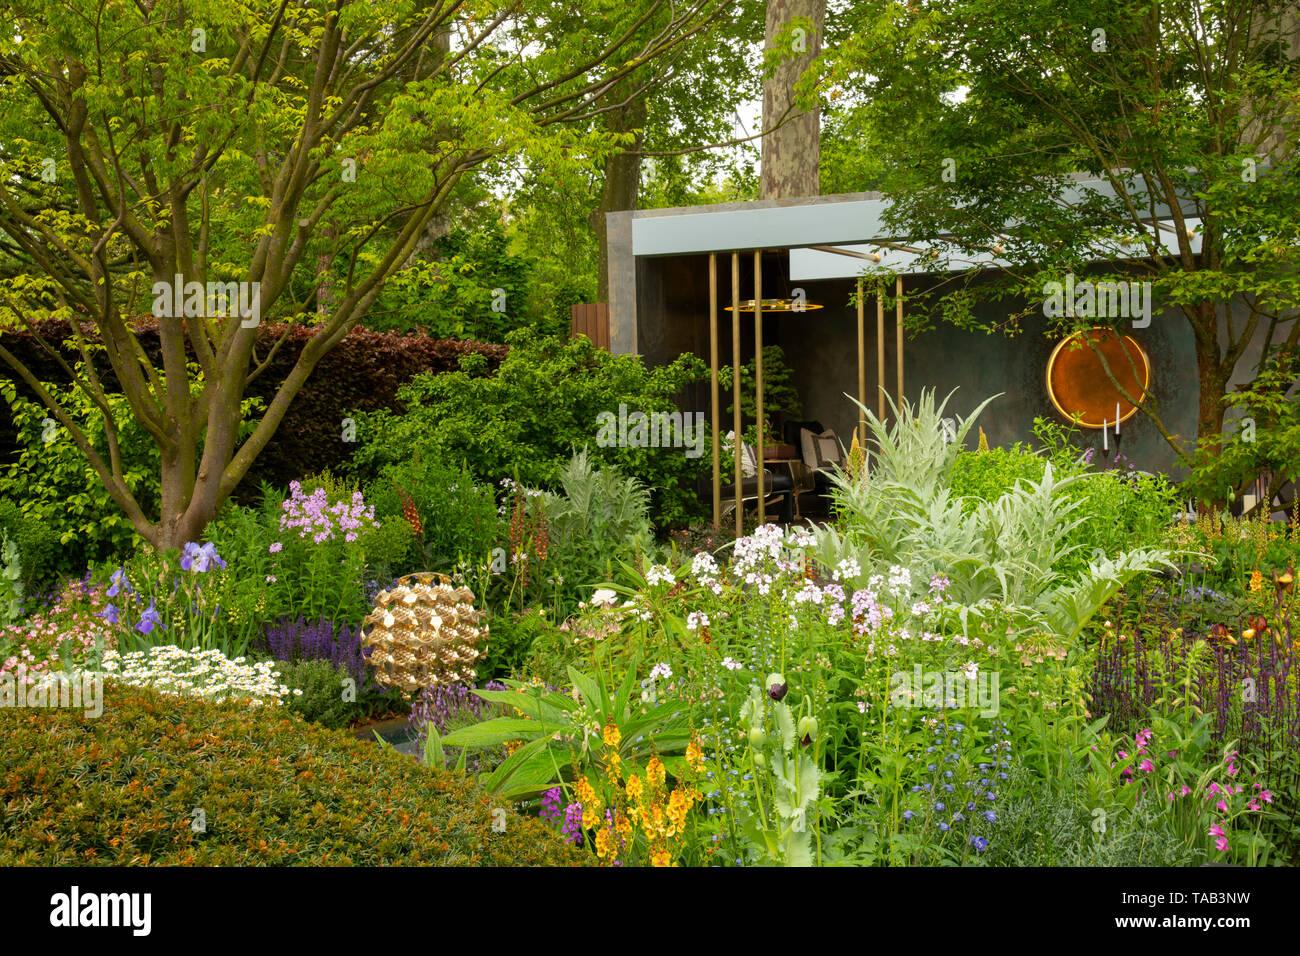 the morgan stanley garden designed by chris beardshaw and winner of